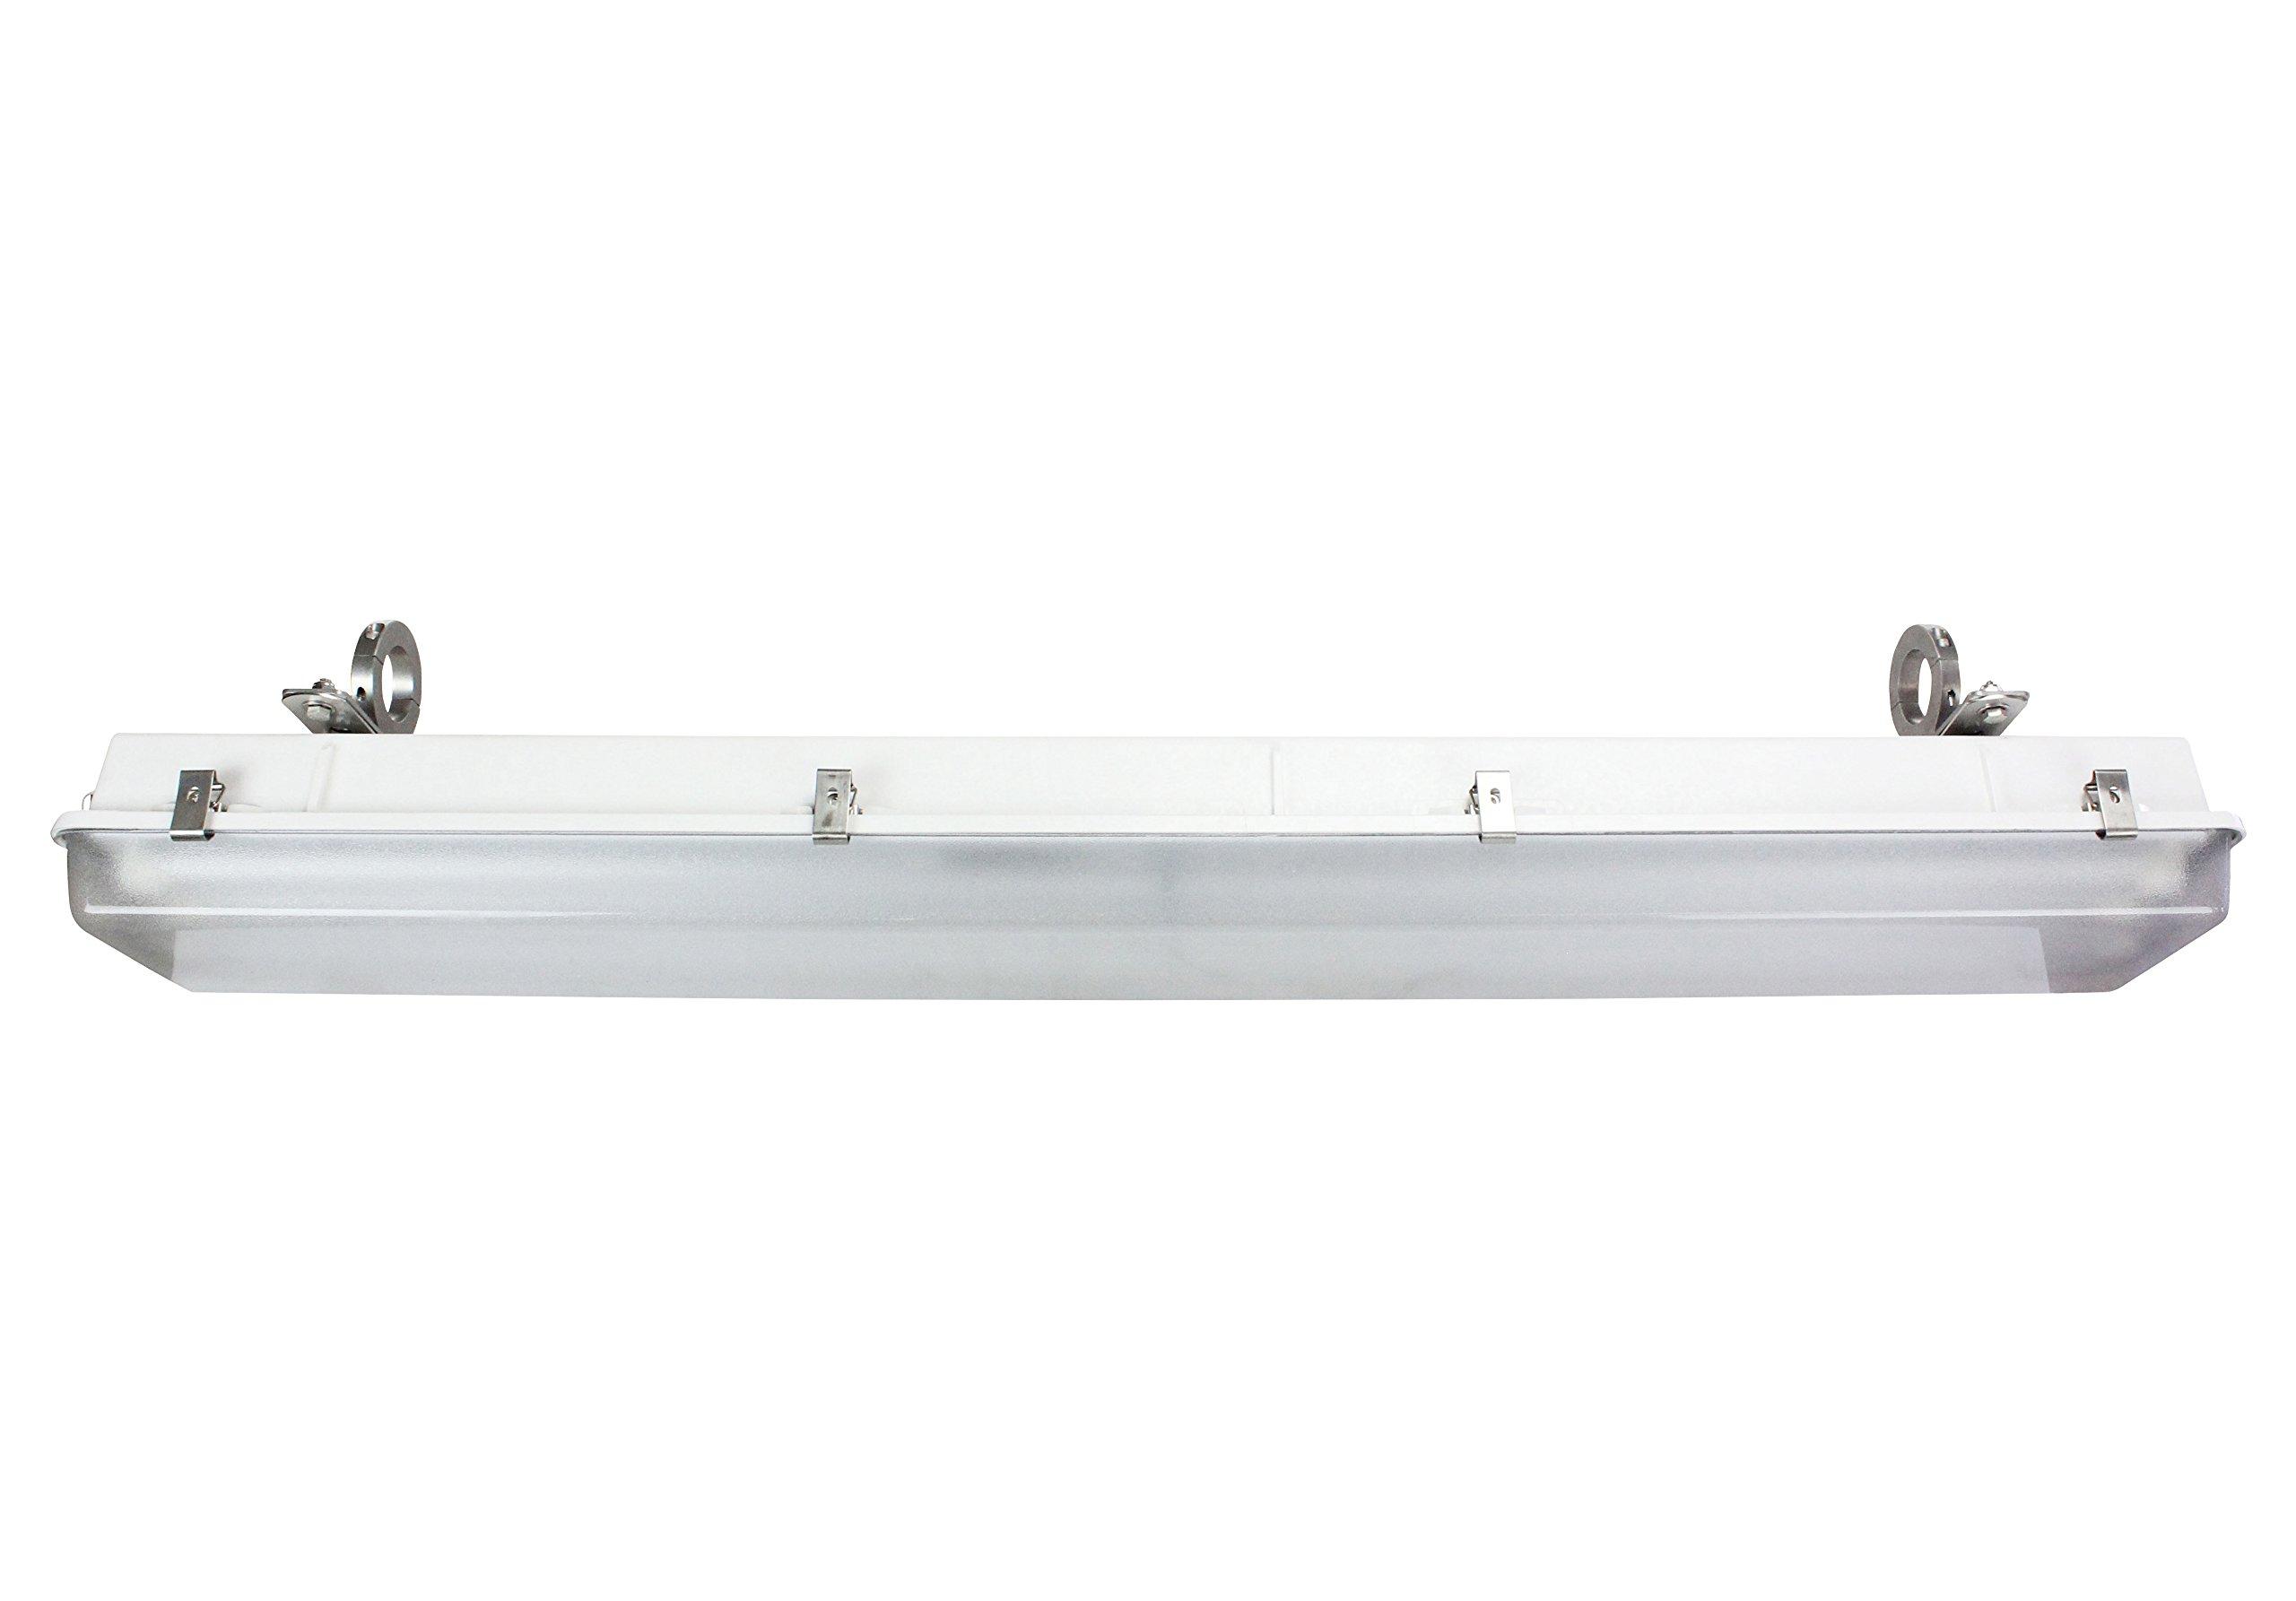 3-Lamp Corrosion Resistant Fluorescent Light Fixture - 2'' Stainless Steel Pole Mount Brackets(-54W 5000K-T5HO-3in)